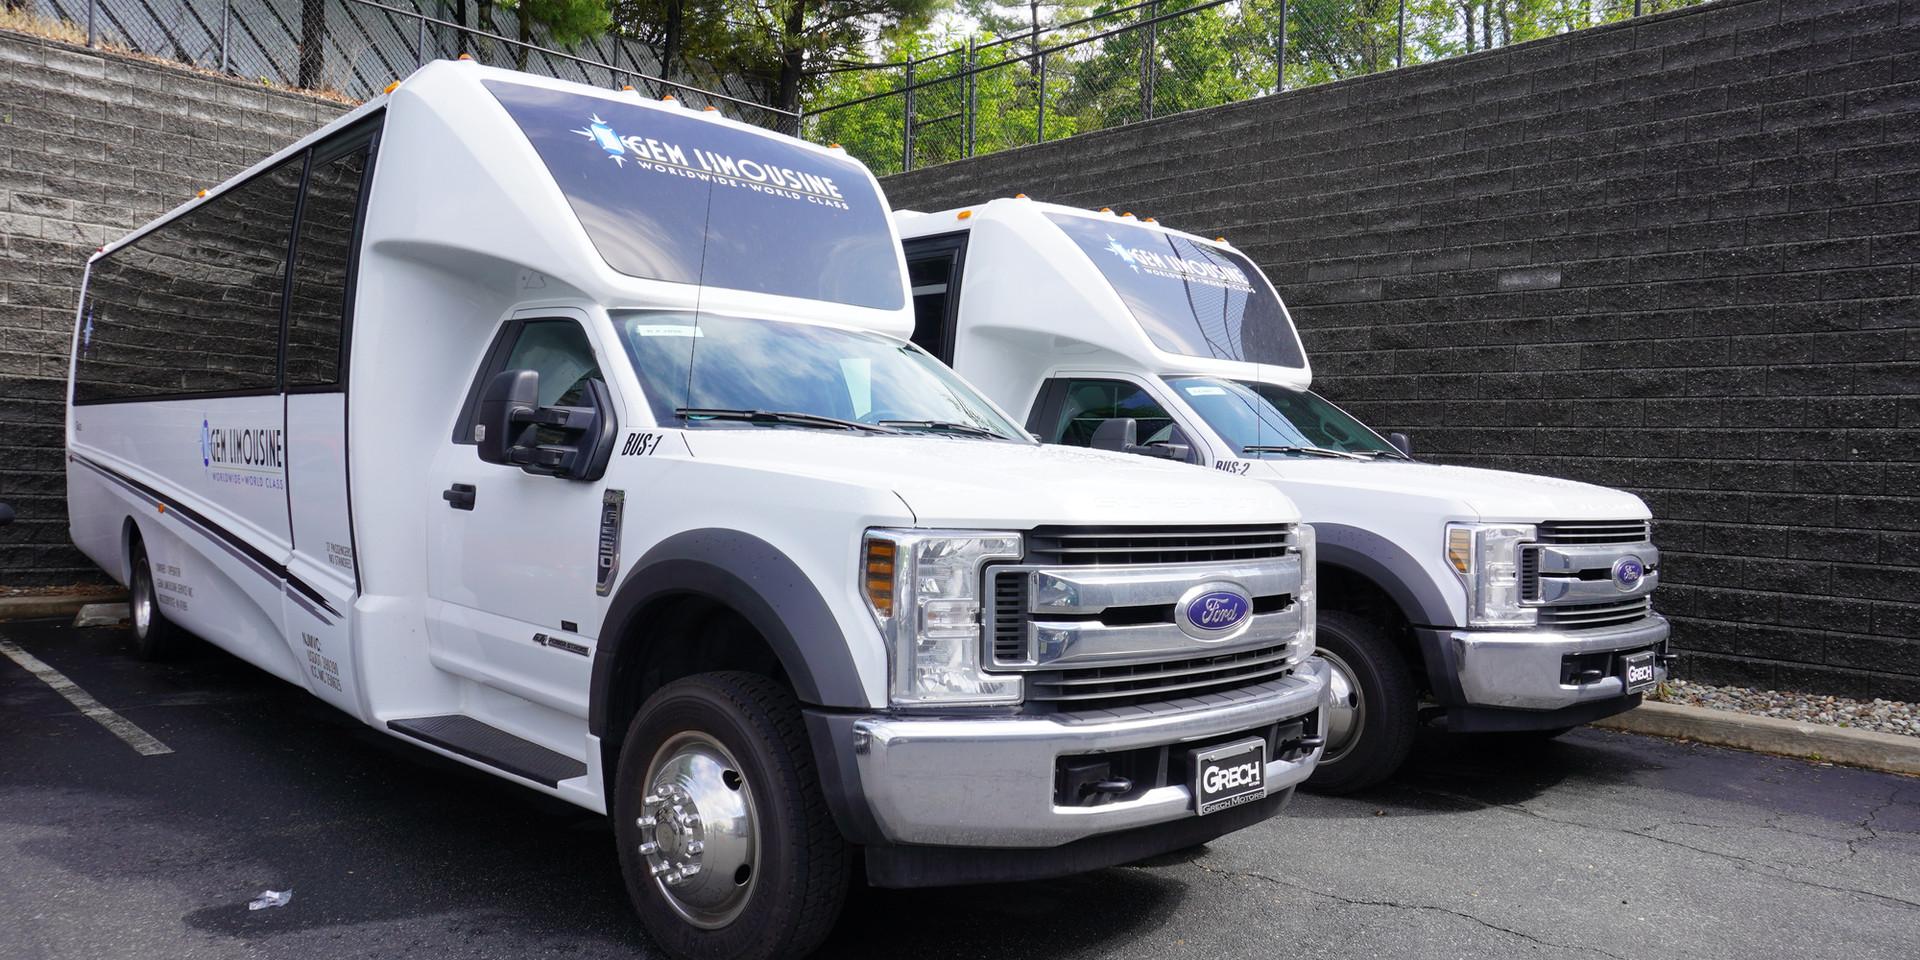 Bus Services - Corporate Transportation.